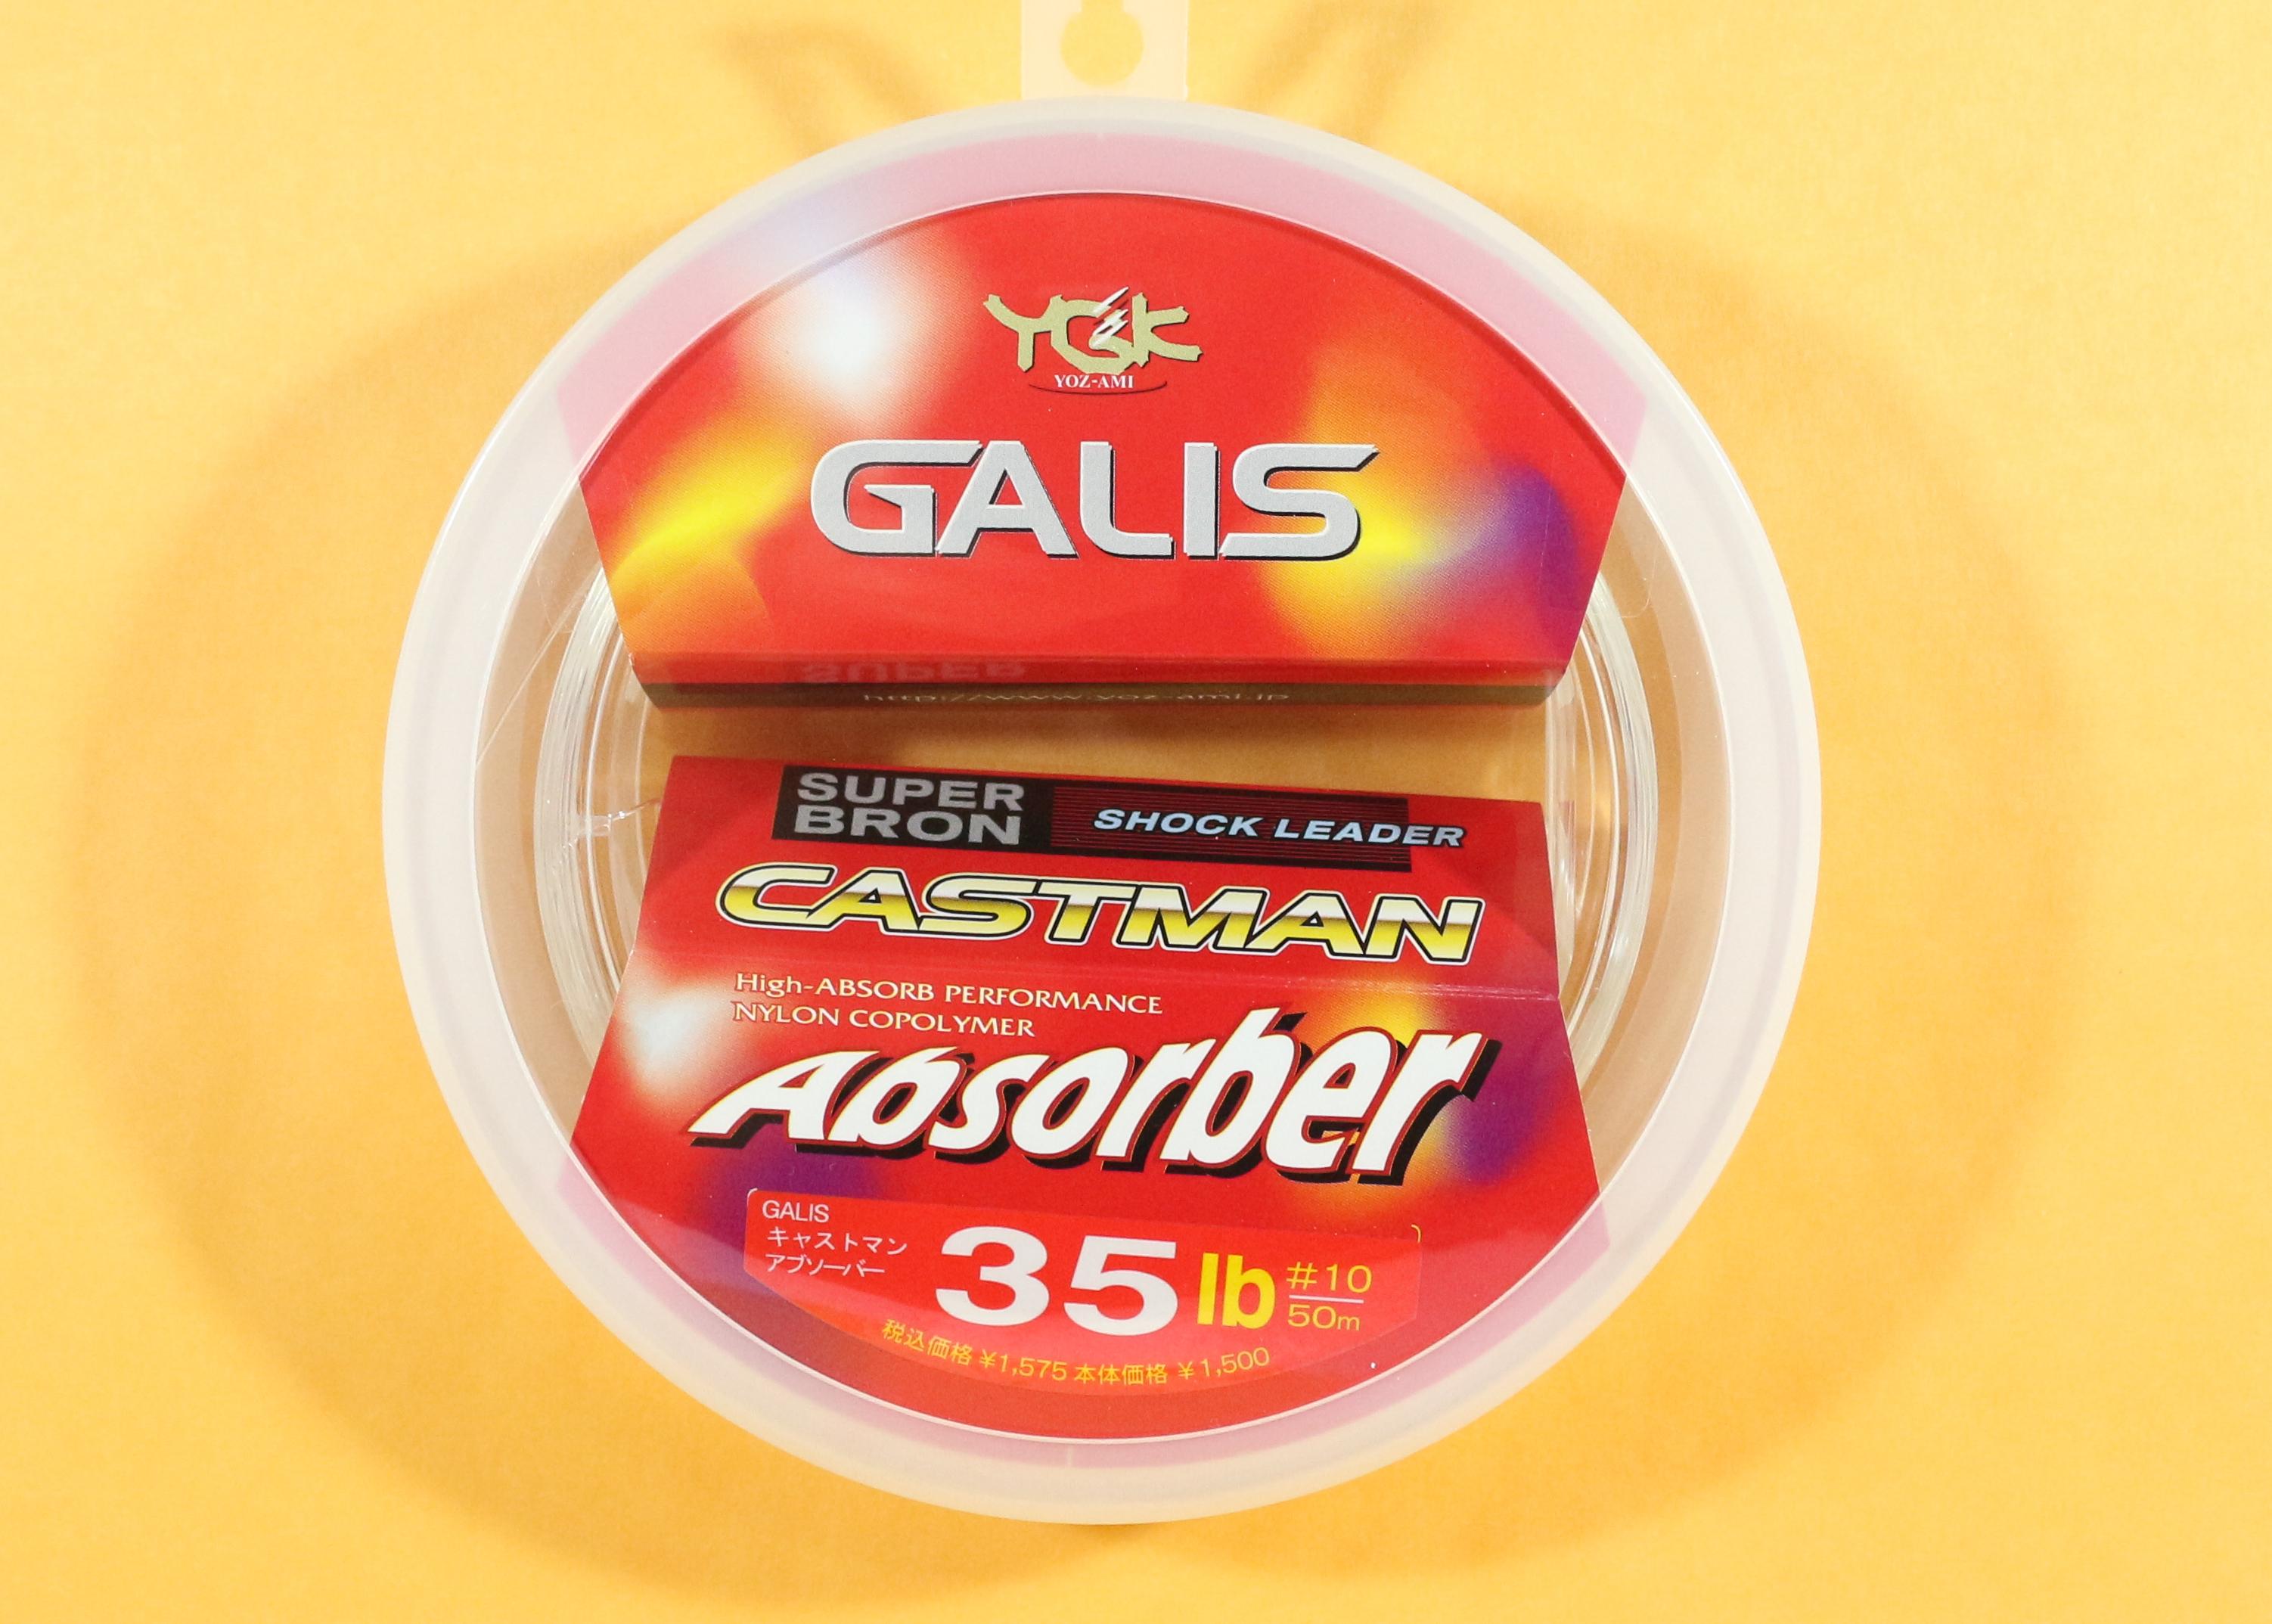 YGK Absorber Castman Nylon Shock Leader Line 50m 35lb (9854)